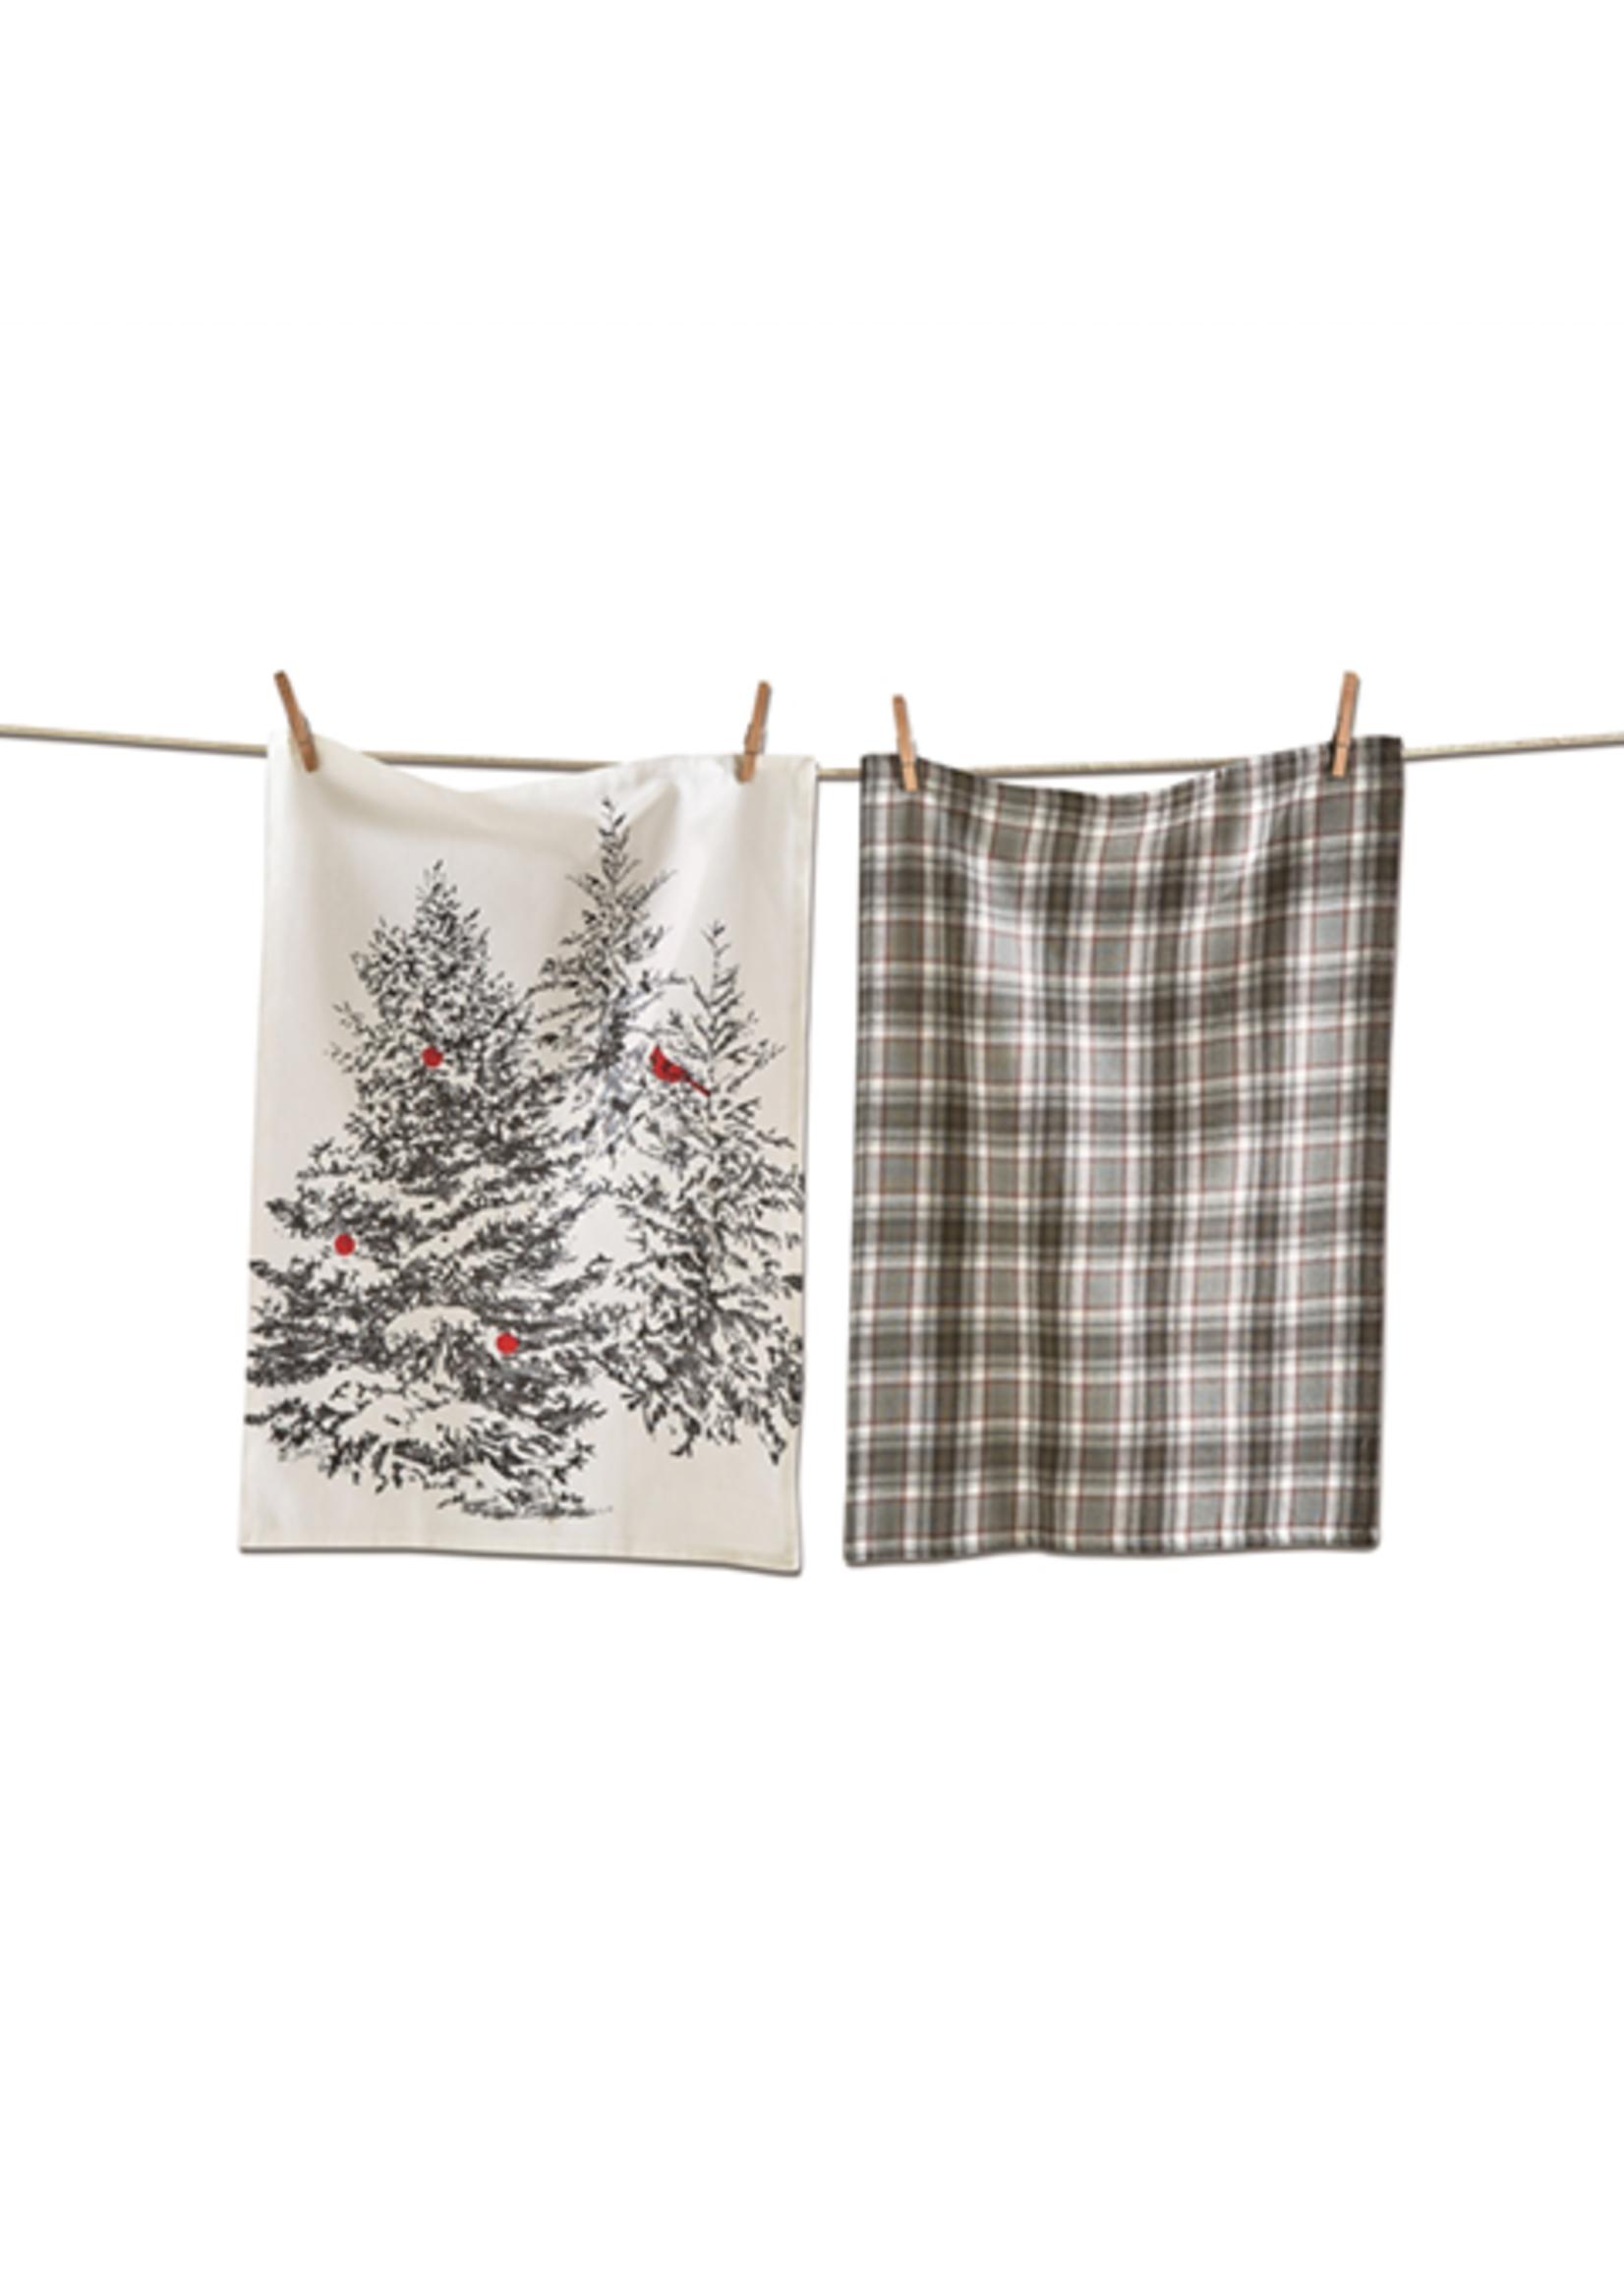 Tag True Living Winter Sketches Tree Dishtowel Set 2